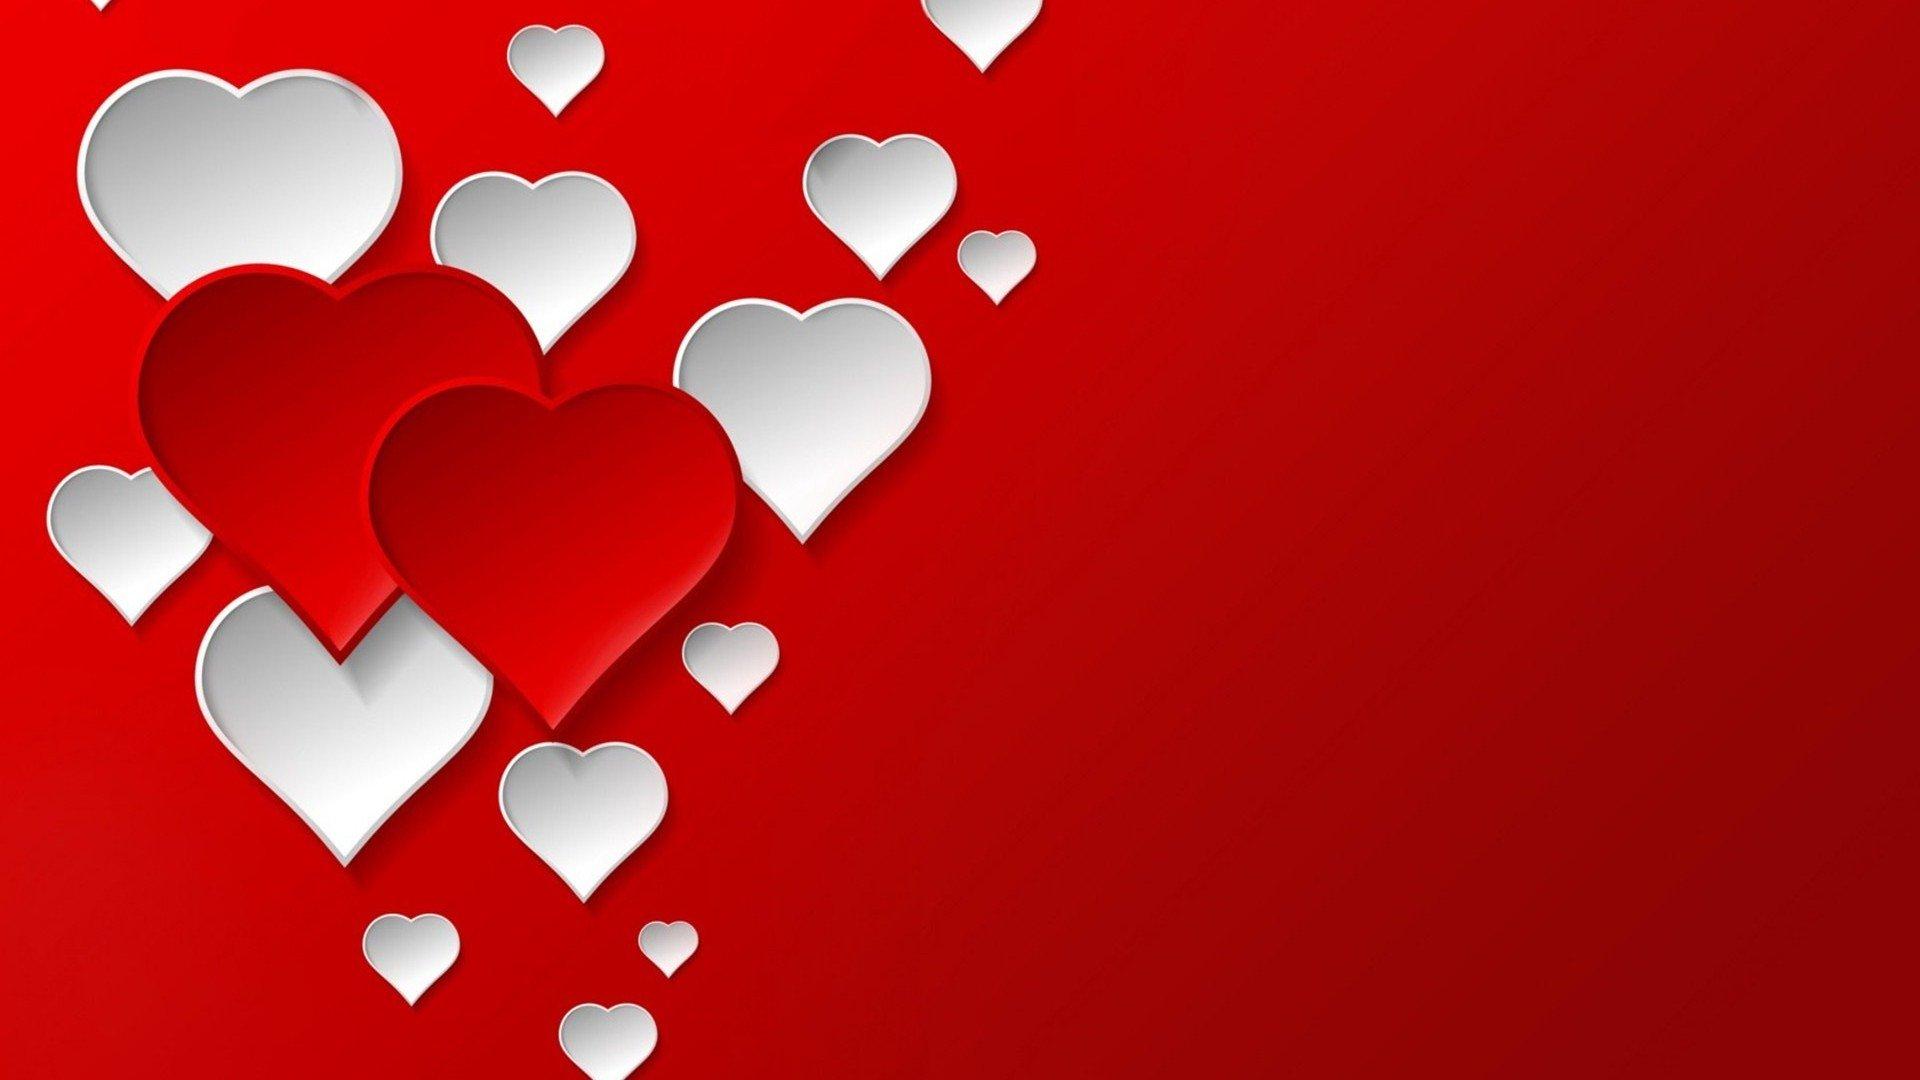 Cute Heart Wallpapers 1920x1080